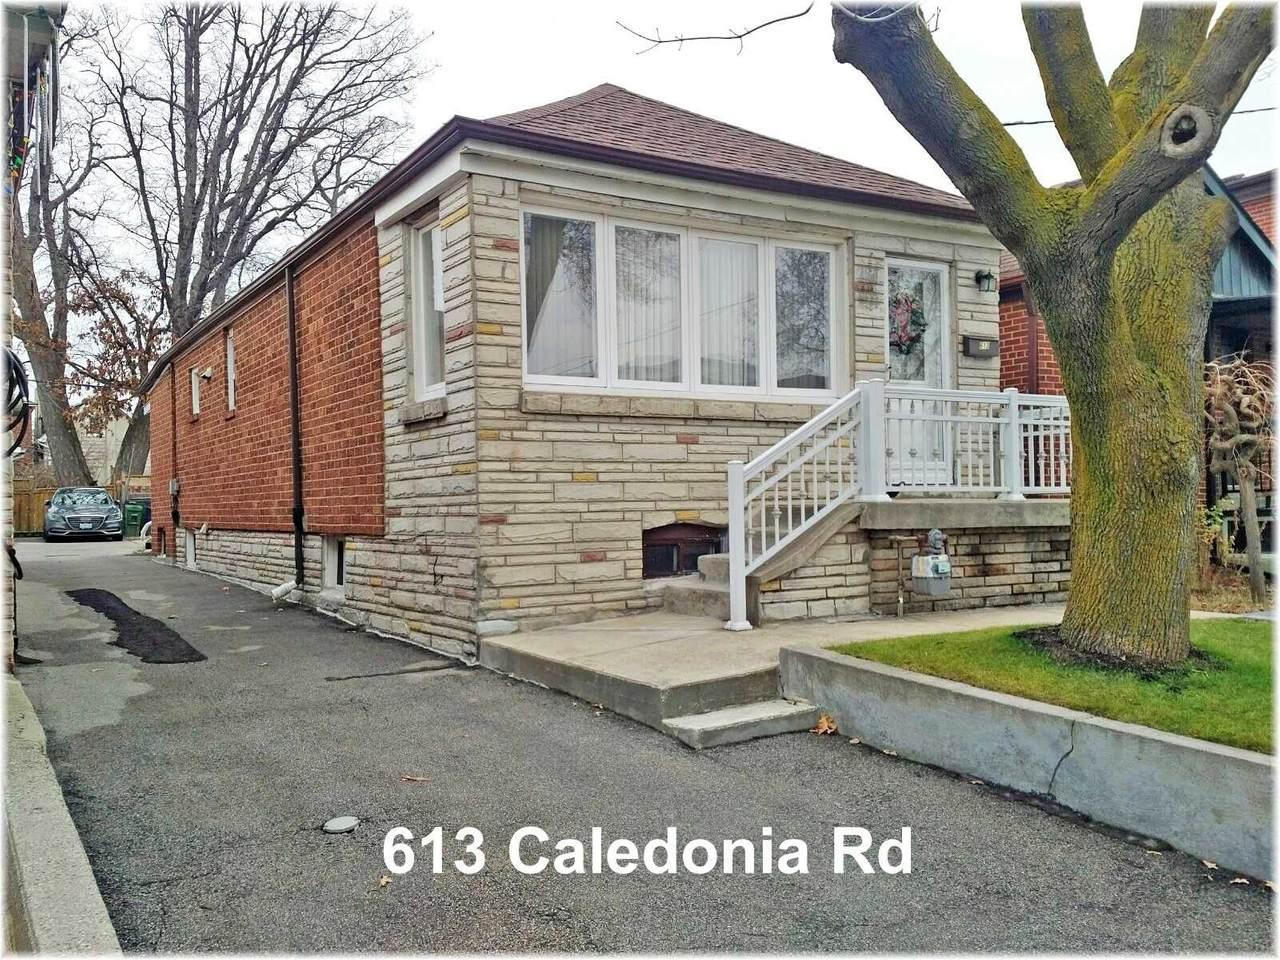 613 Caledonia Rd - Photo 1